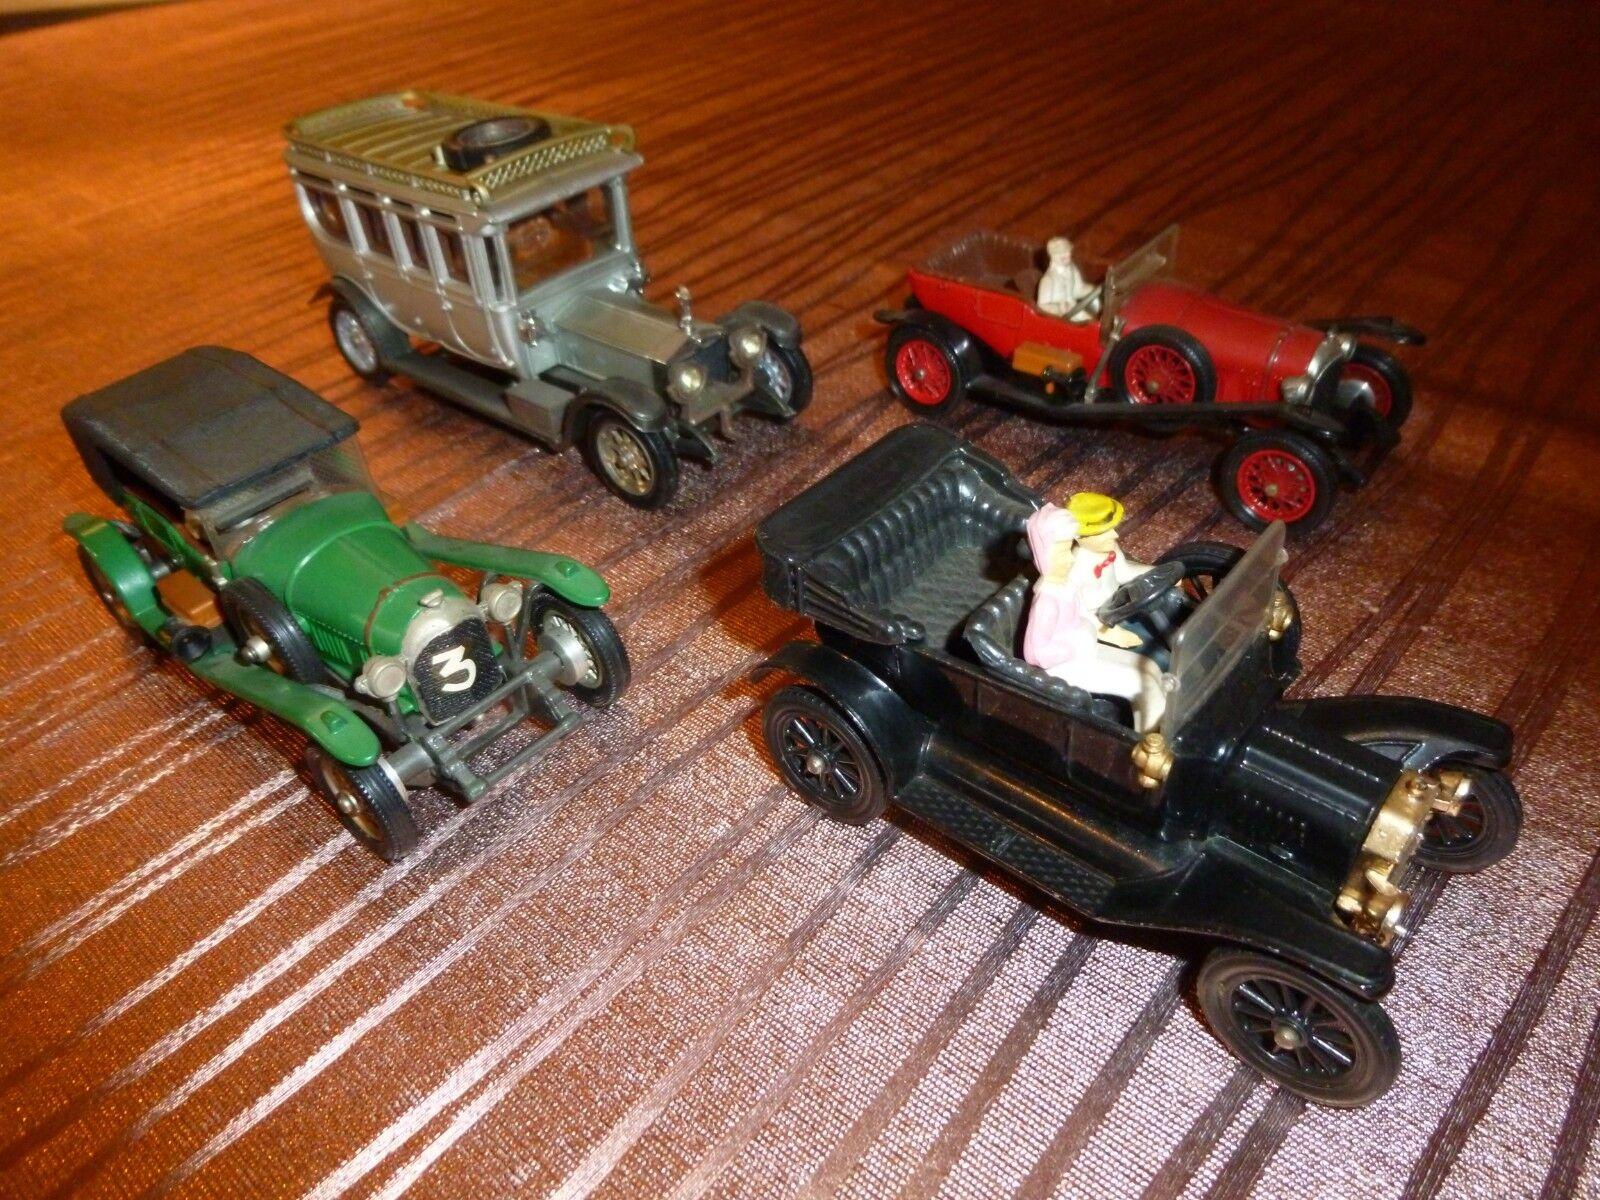 grandes ofertas Lot 4 voitures voitures voitures miniatures CORGI Classics Made in Gt BRITAIN an 70  ganancia cero